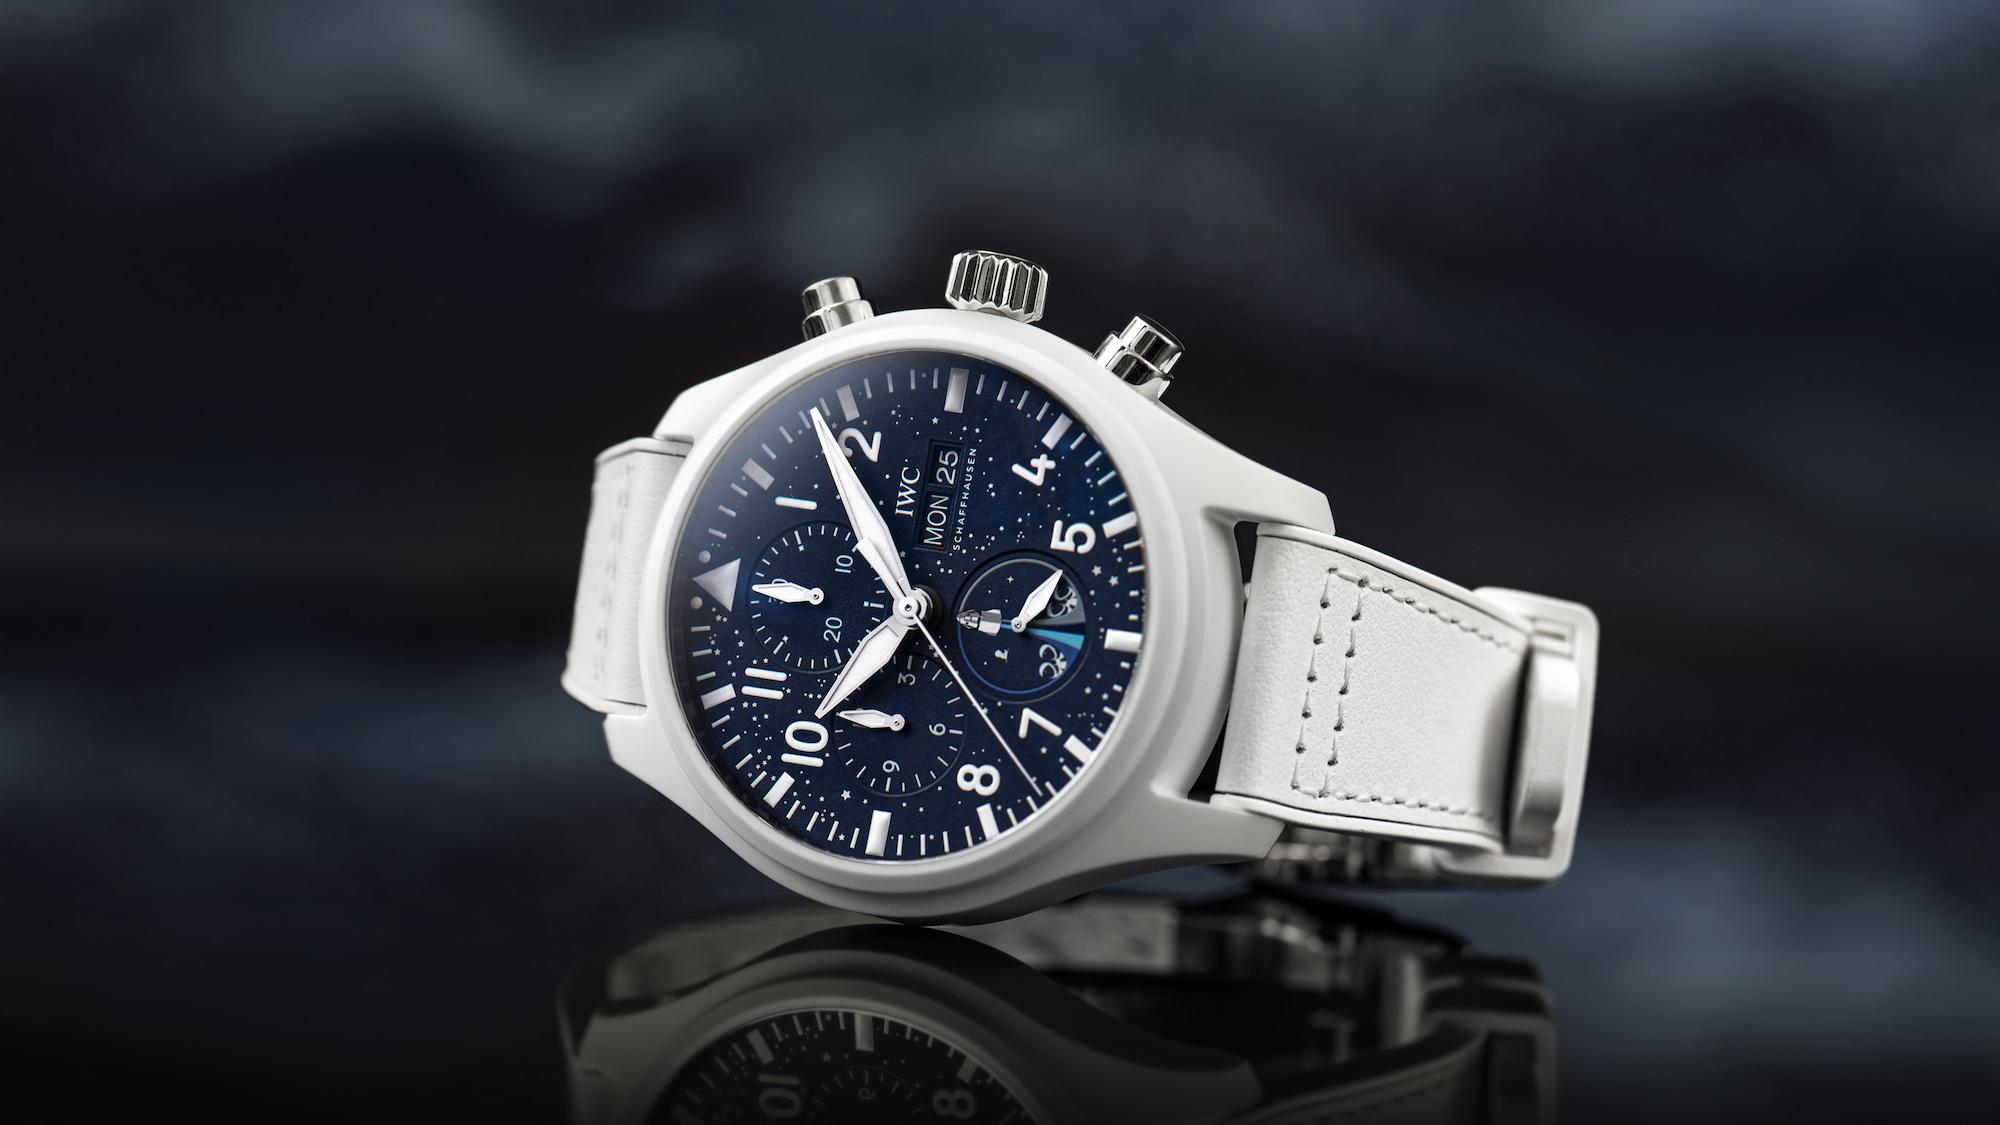 IWC Pilot's Watch Chronograph Inspiration4 Edition IW389110